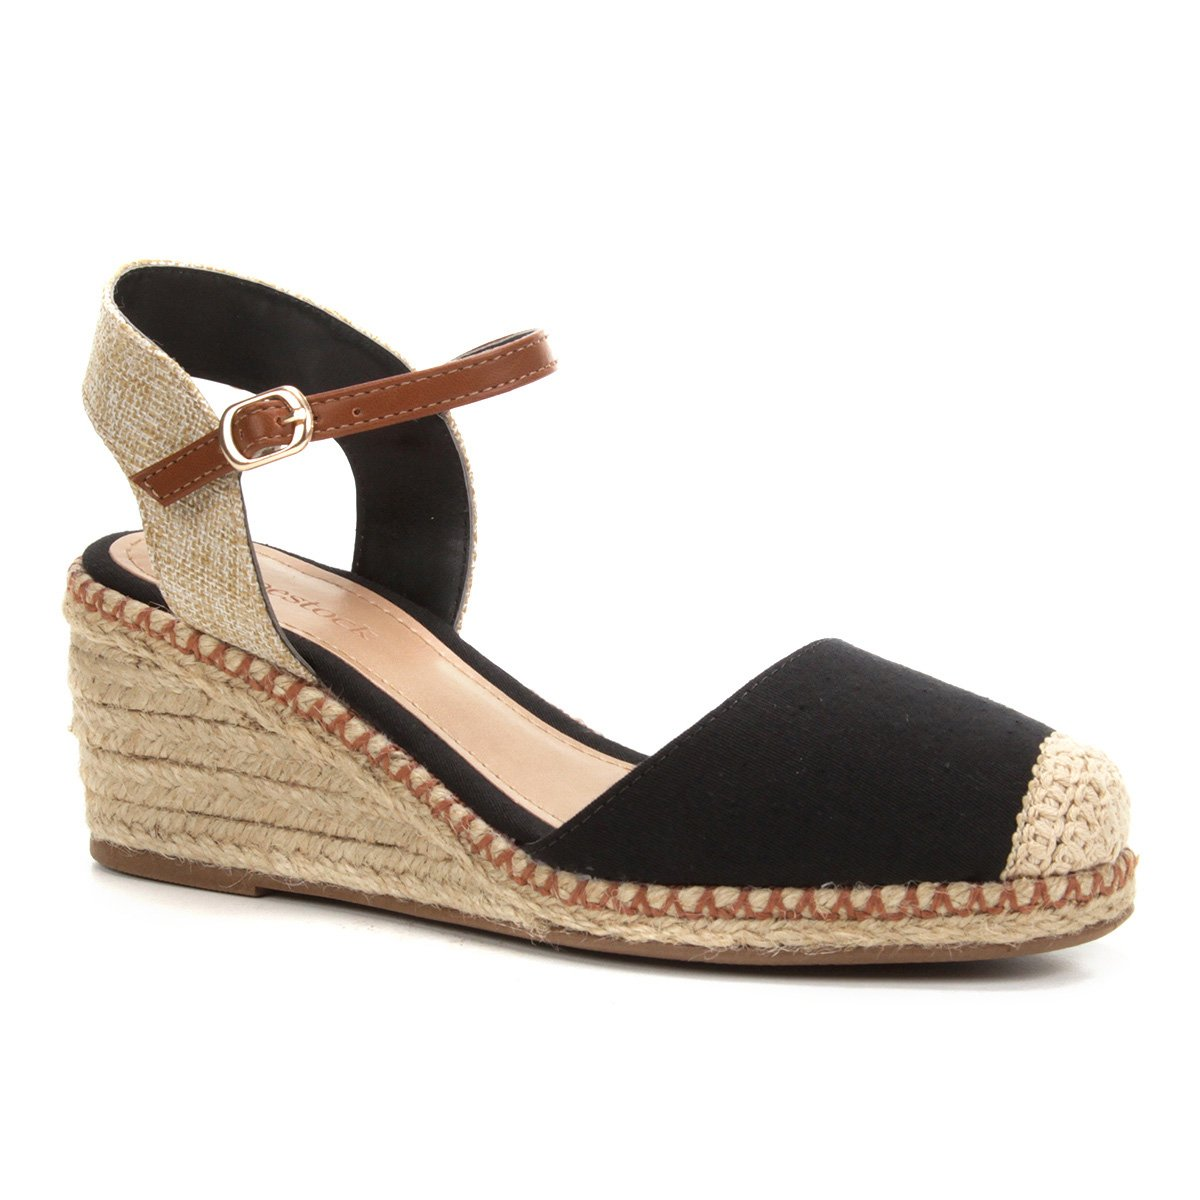 b9f32d70ed Sandália Anabela Shoestock Corda Lona Feminina - Preto - Compre Agora